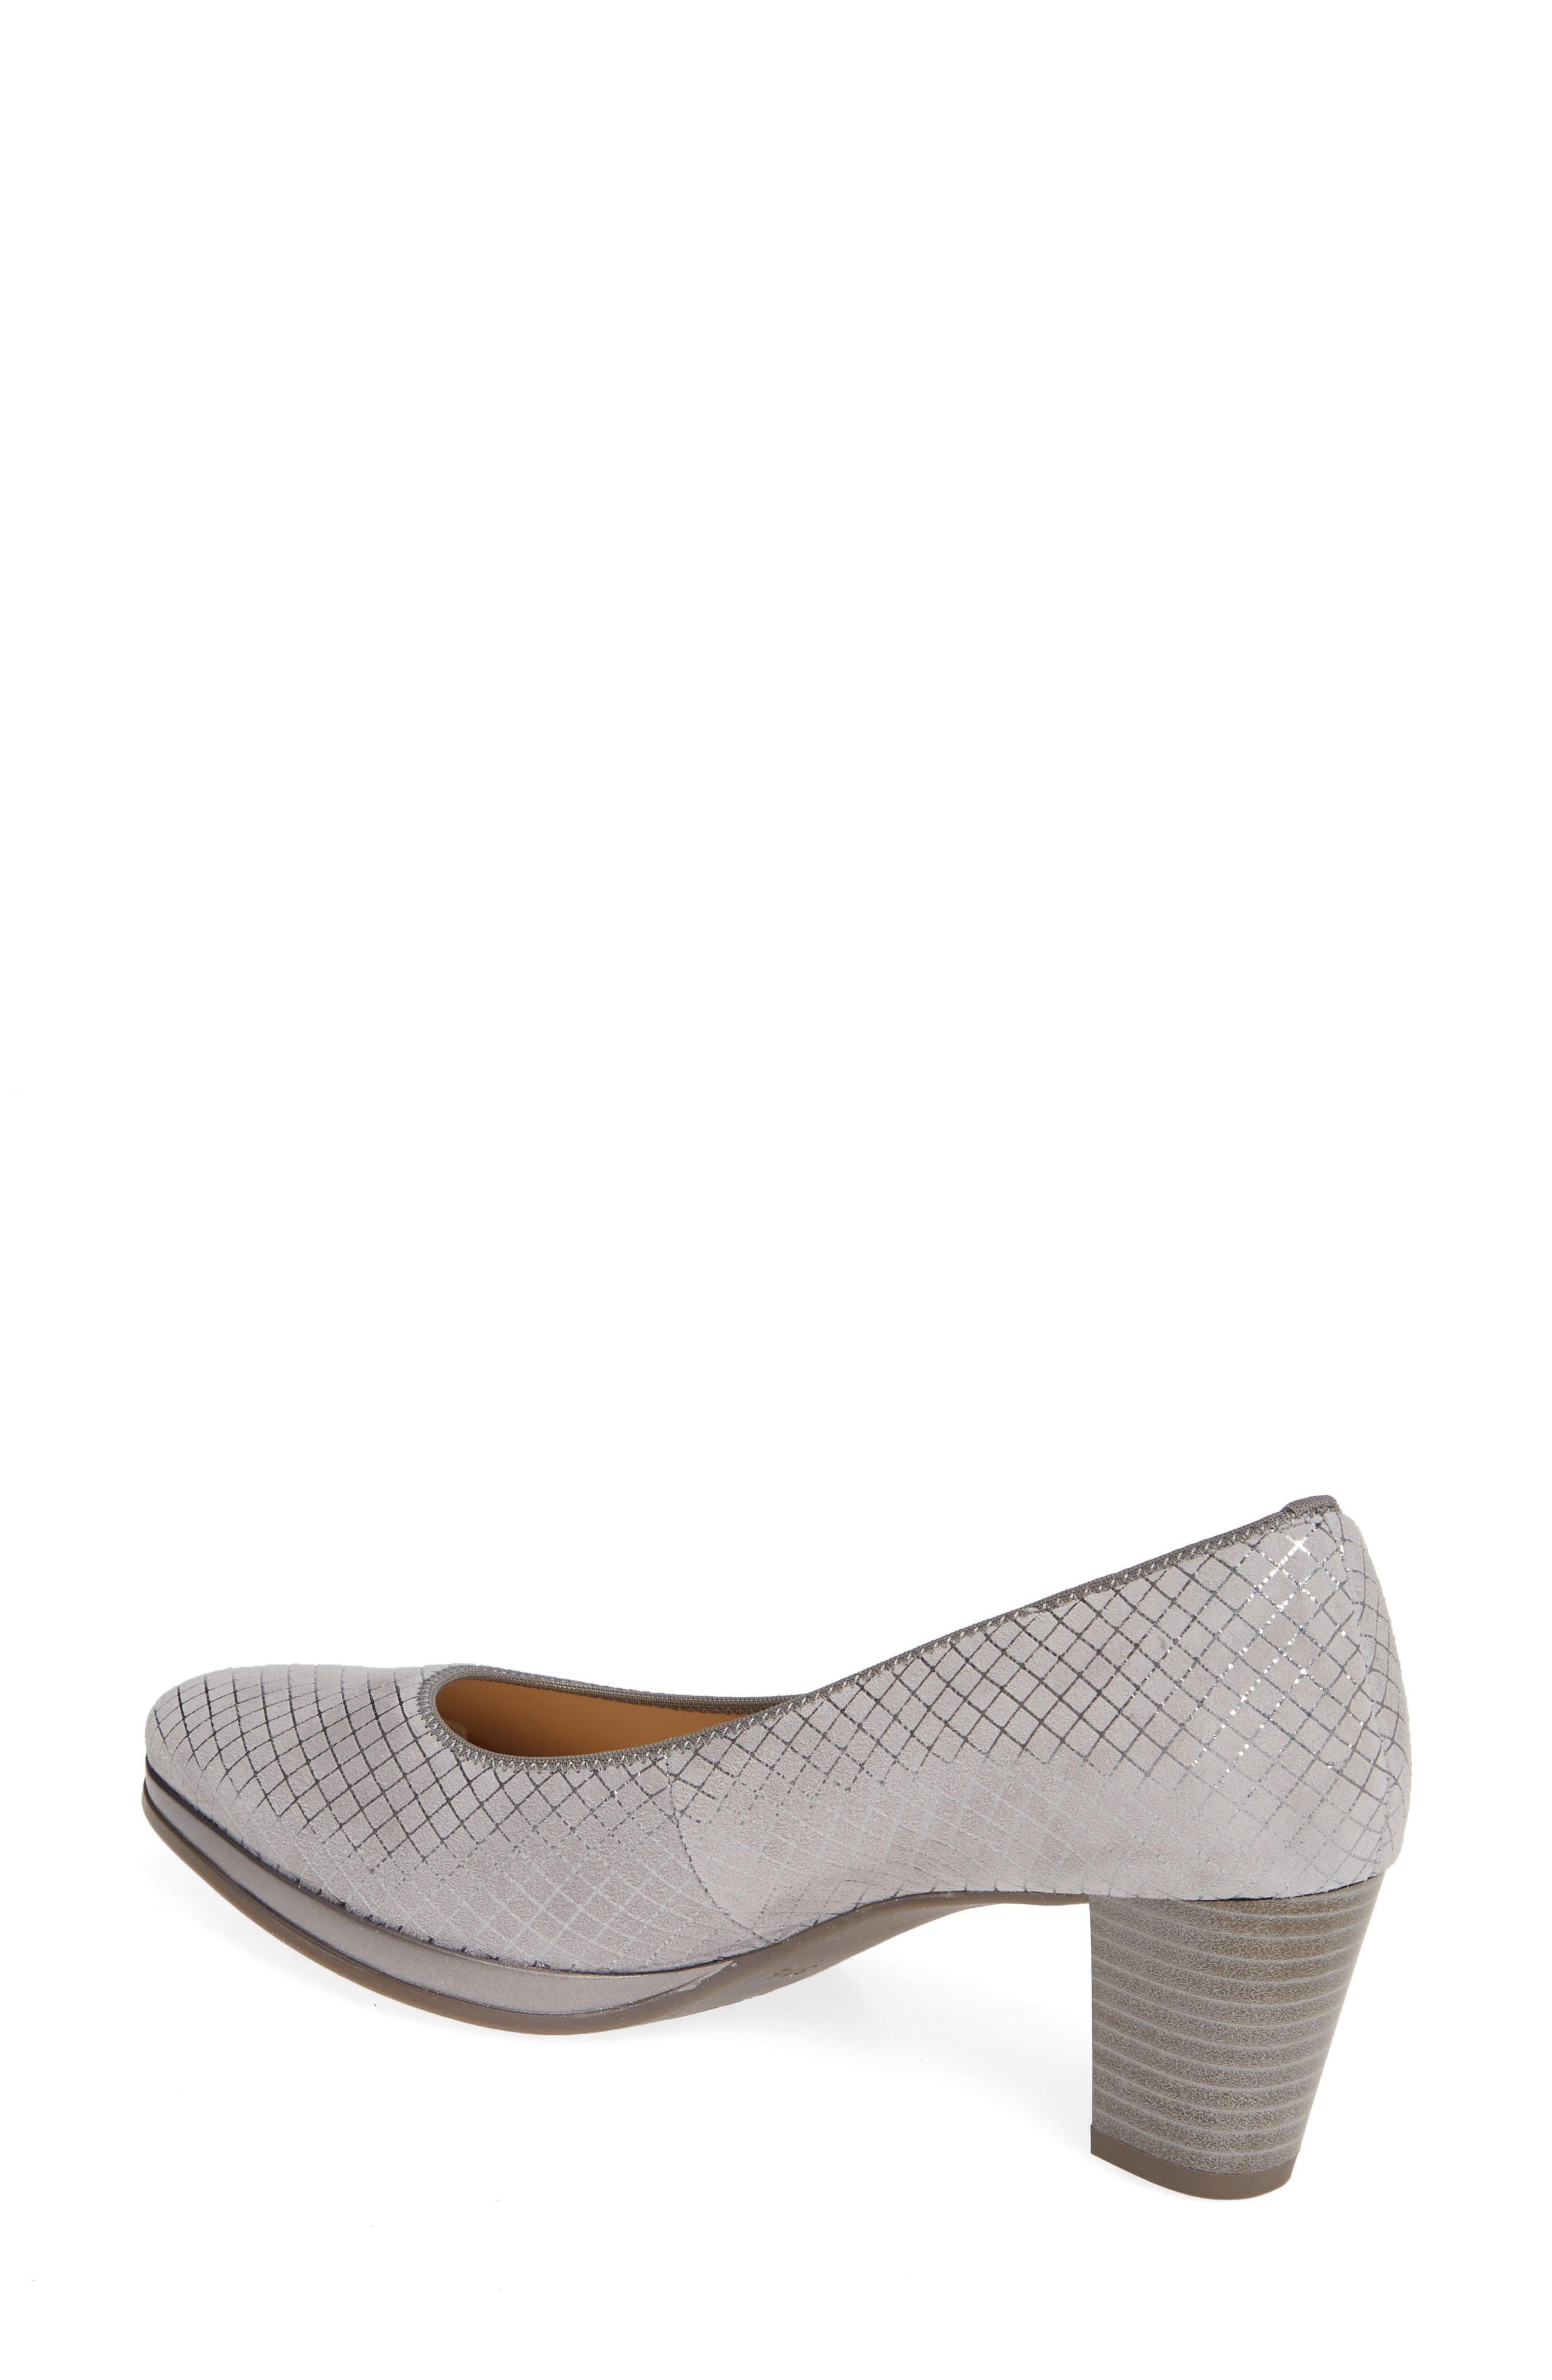 Buy Gabor Kid Pump Schwarz black Shoes Online | FOOTWAY.co.uk